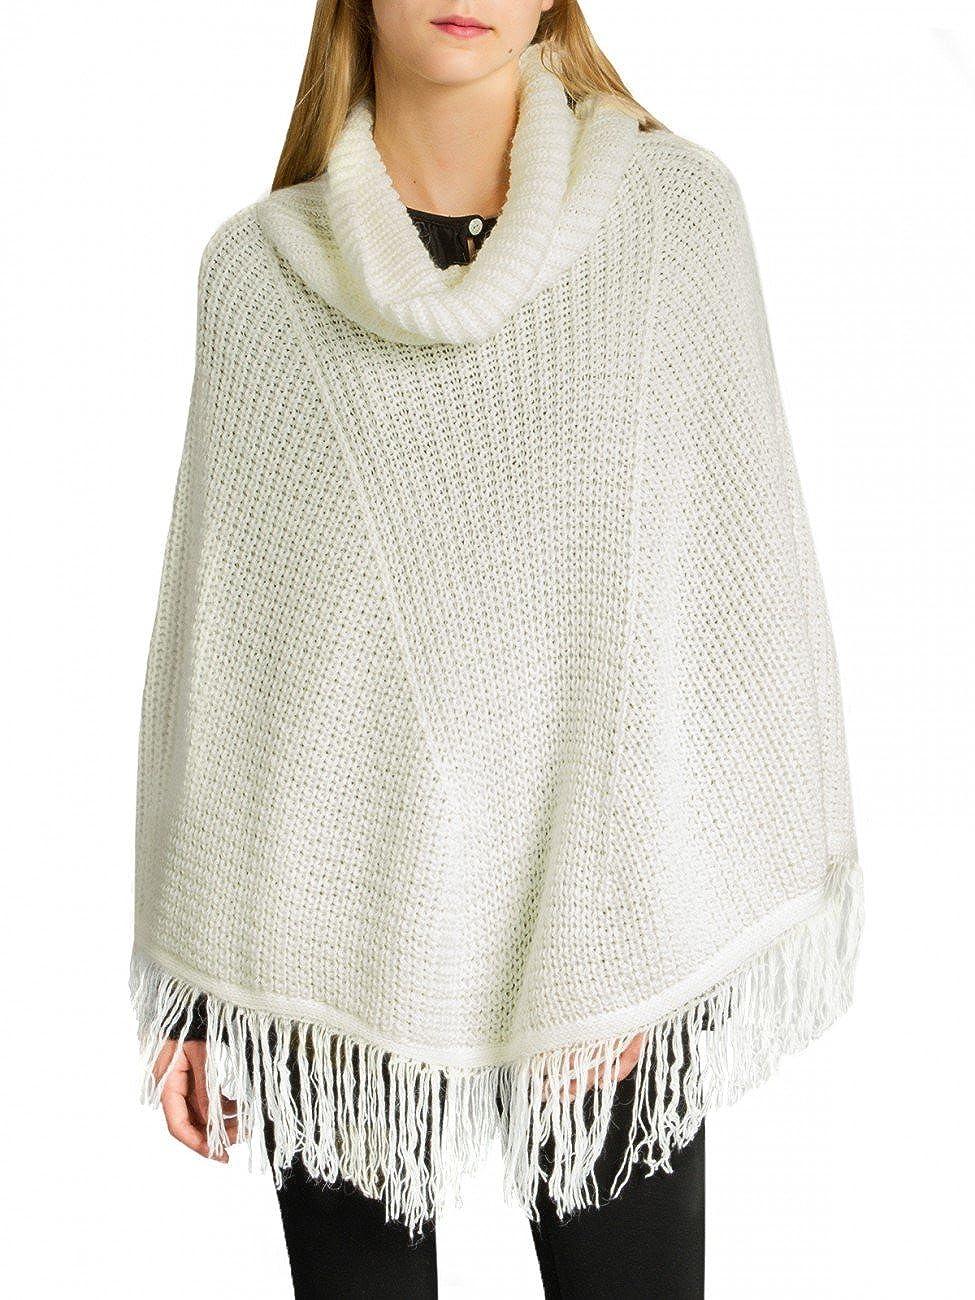 CASPAR PON025 Damen Woll Poncho Farbe:beige; Grö ß e:One Size 4251085255212